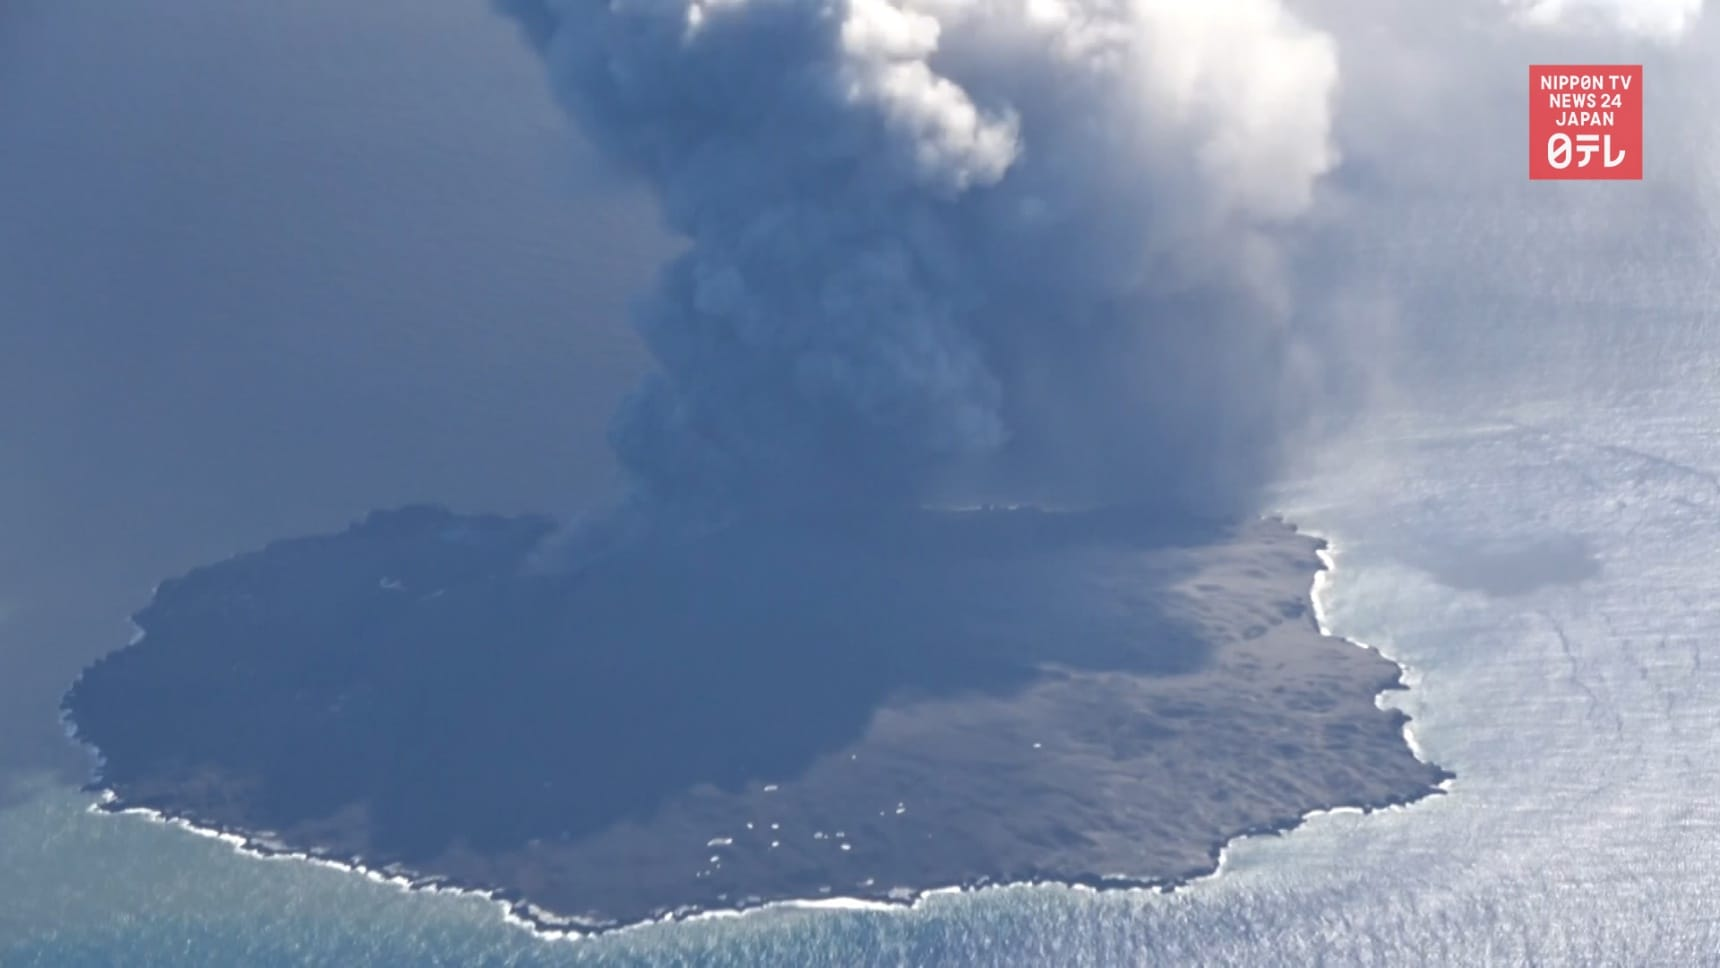 Tokyo Island Emitting High Volume Volcanic Gas